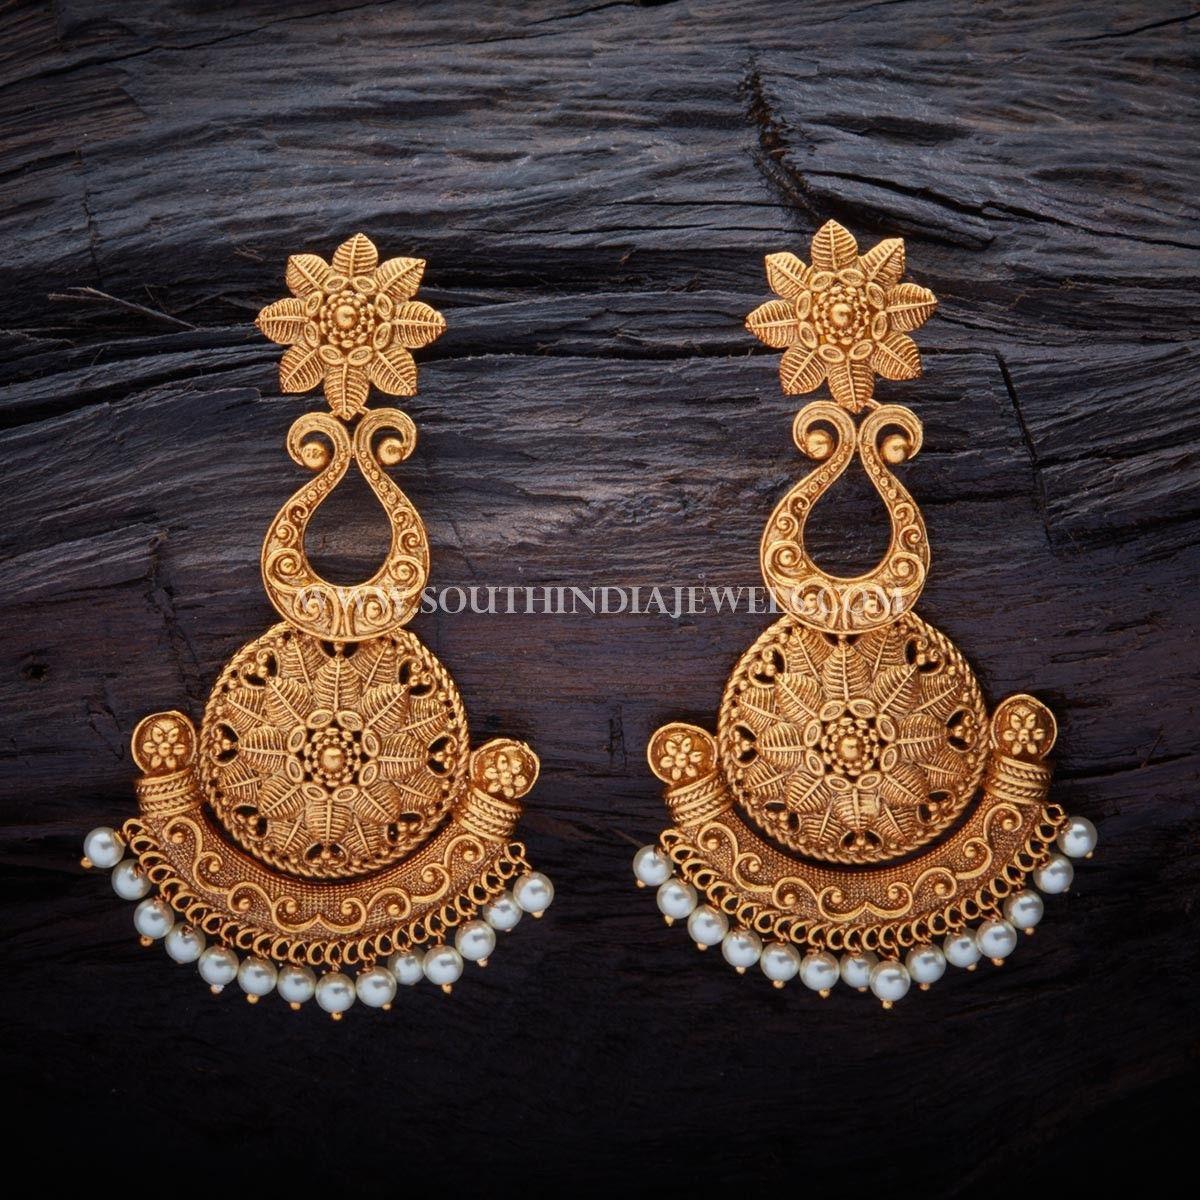 Matt Finish Antique Earrings Design | Fashion jewellery, Bald ...